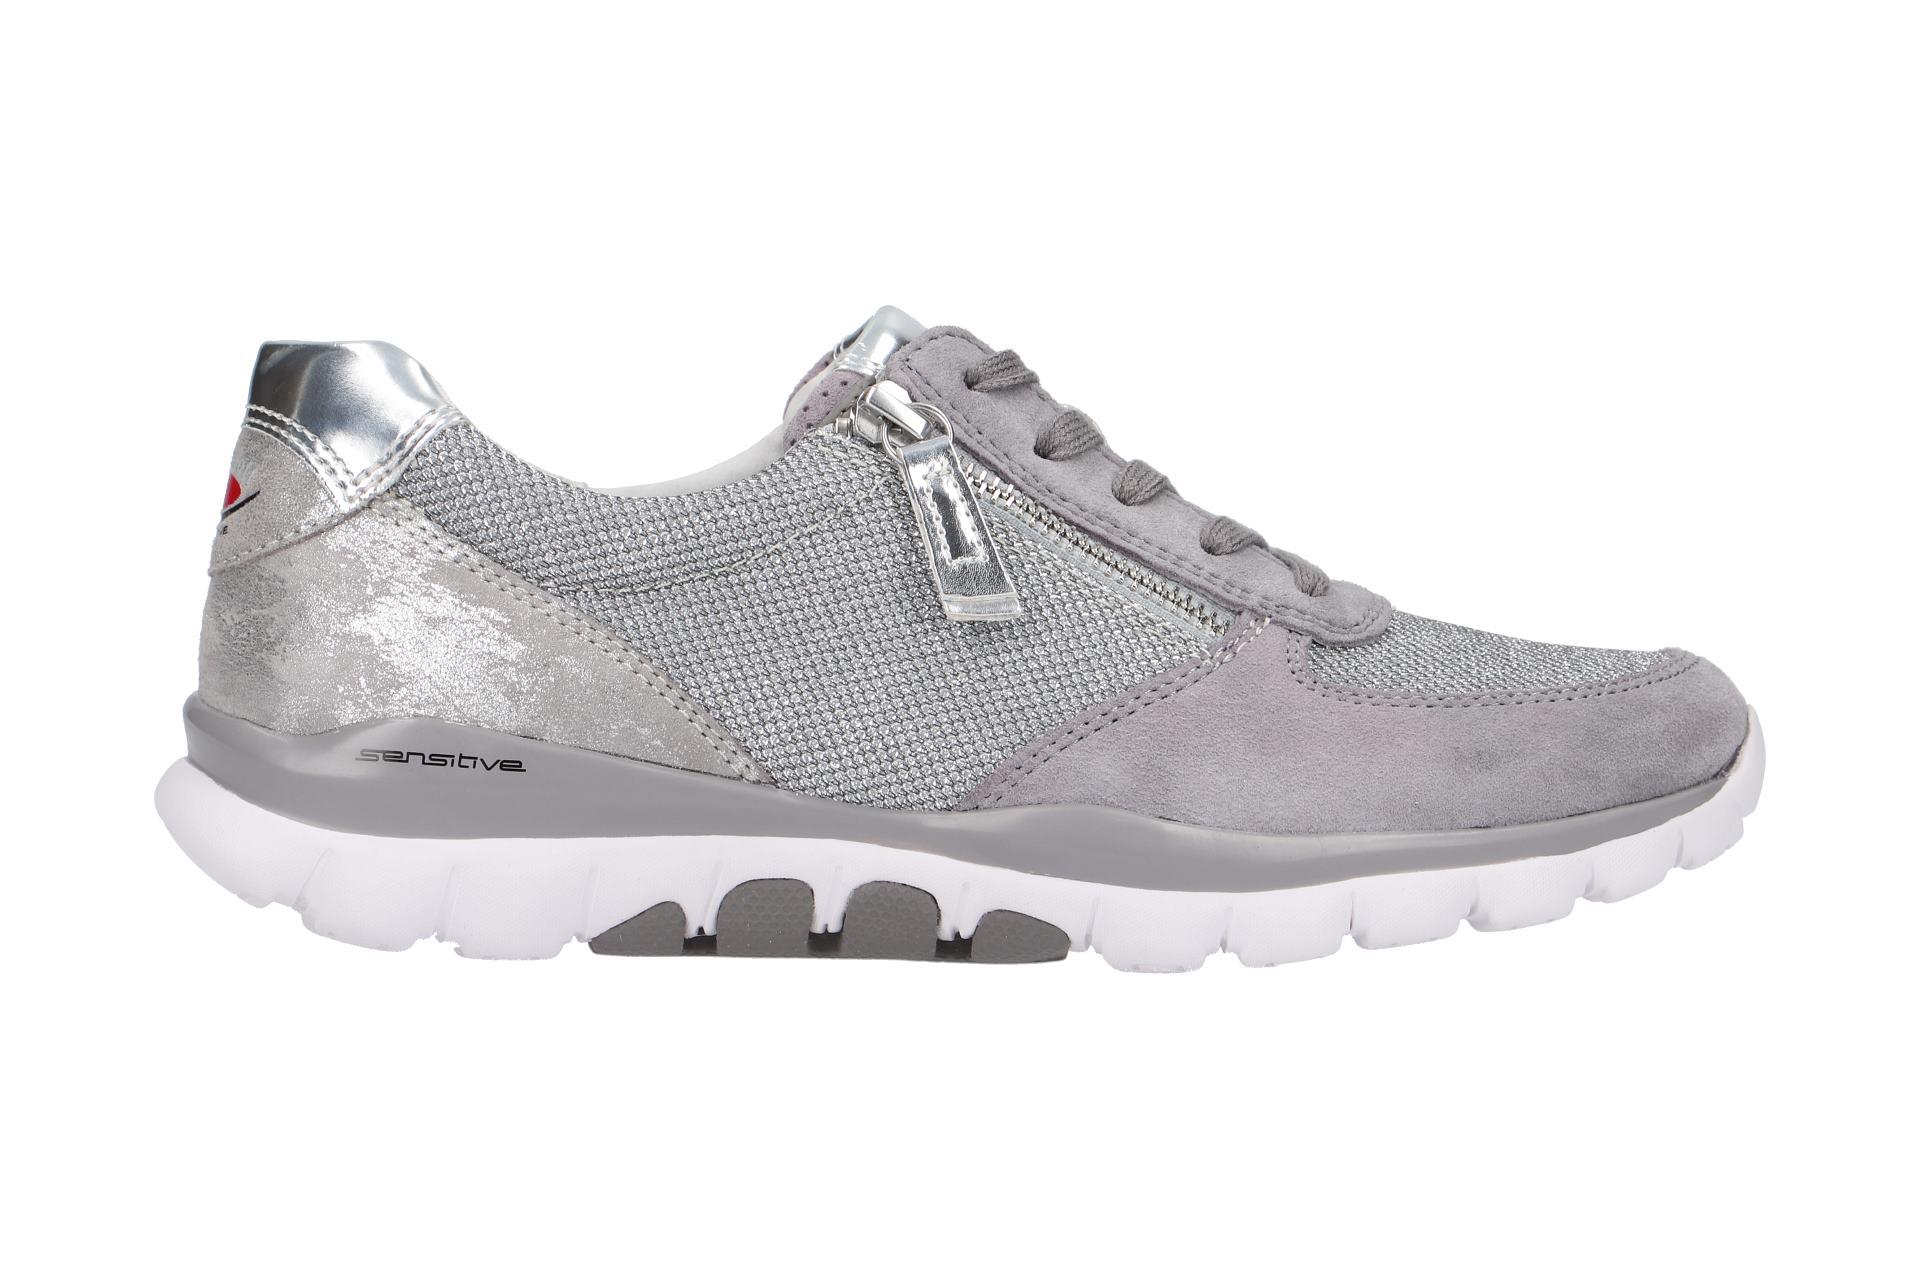 Gabor Schuhe 86.968 grau Damenschuhe Halbschuhe 86.968.15 NEU   eBay cfeab0d3ac